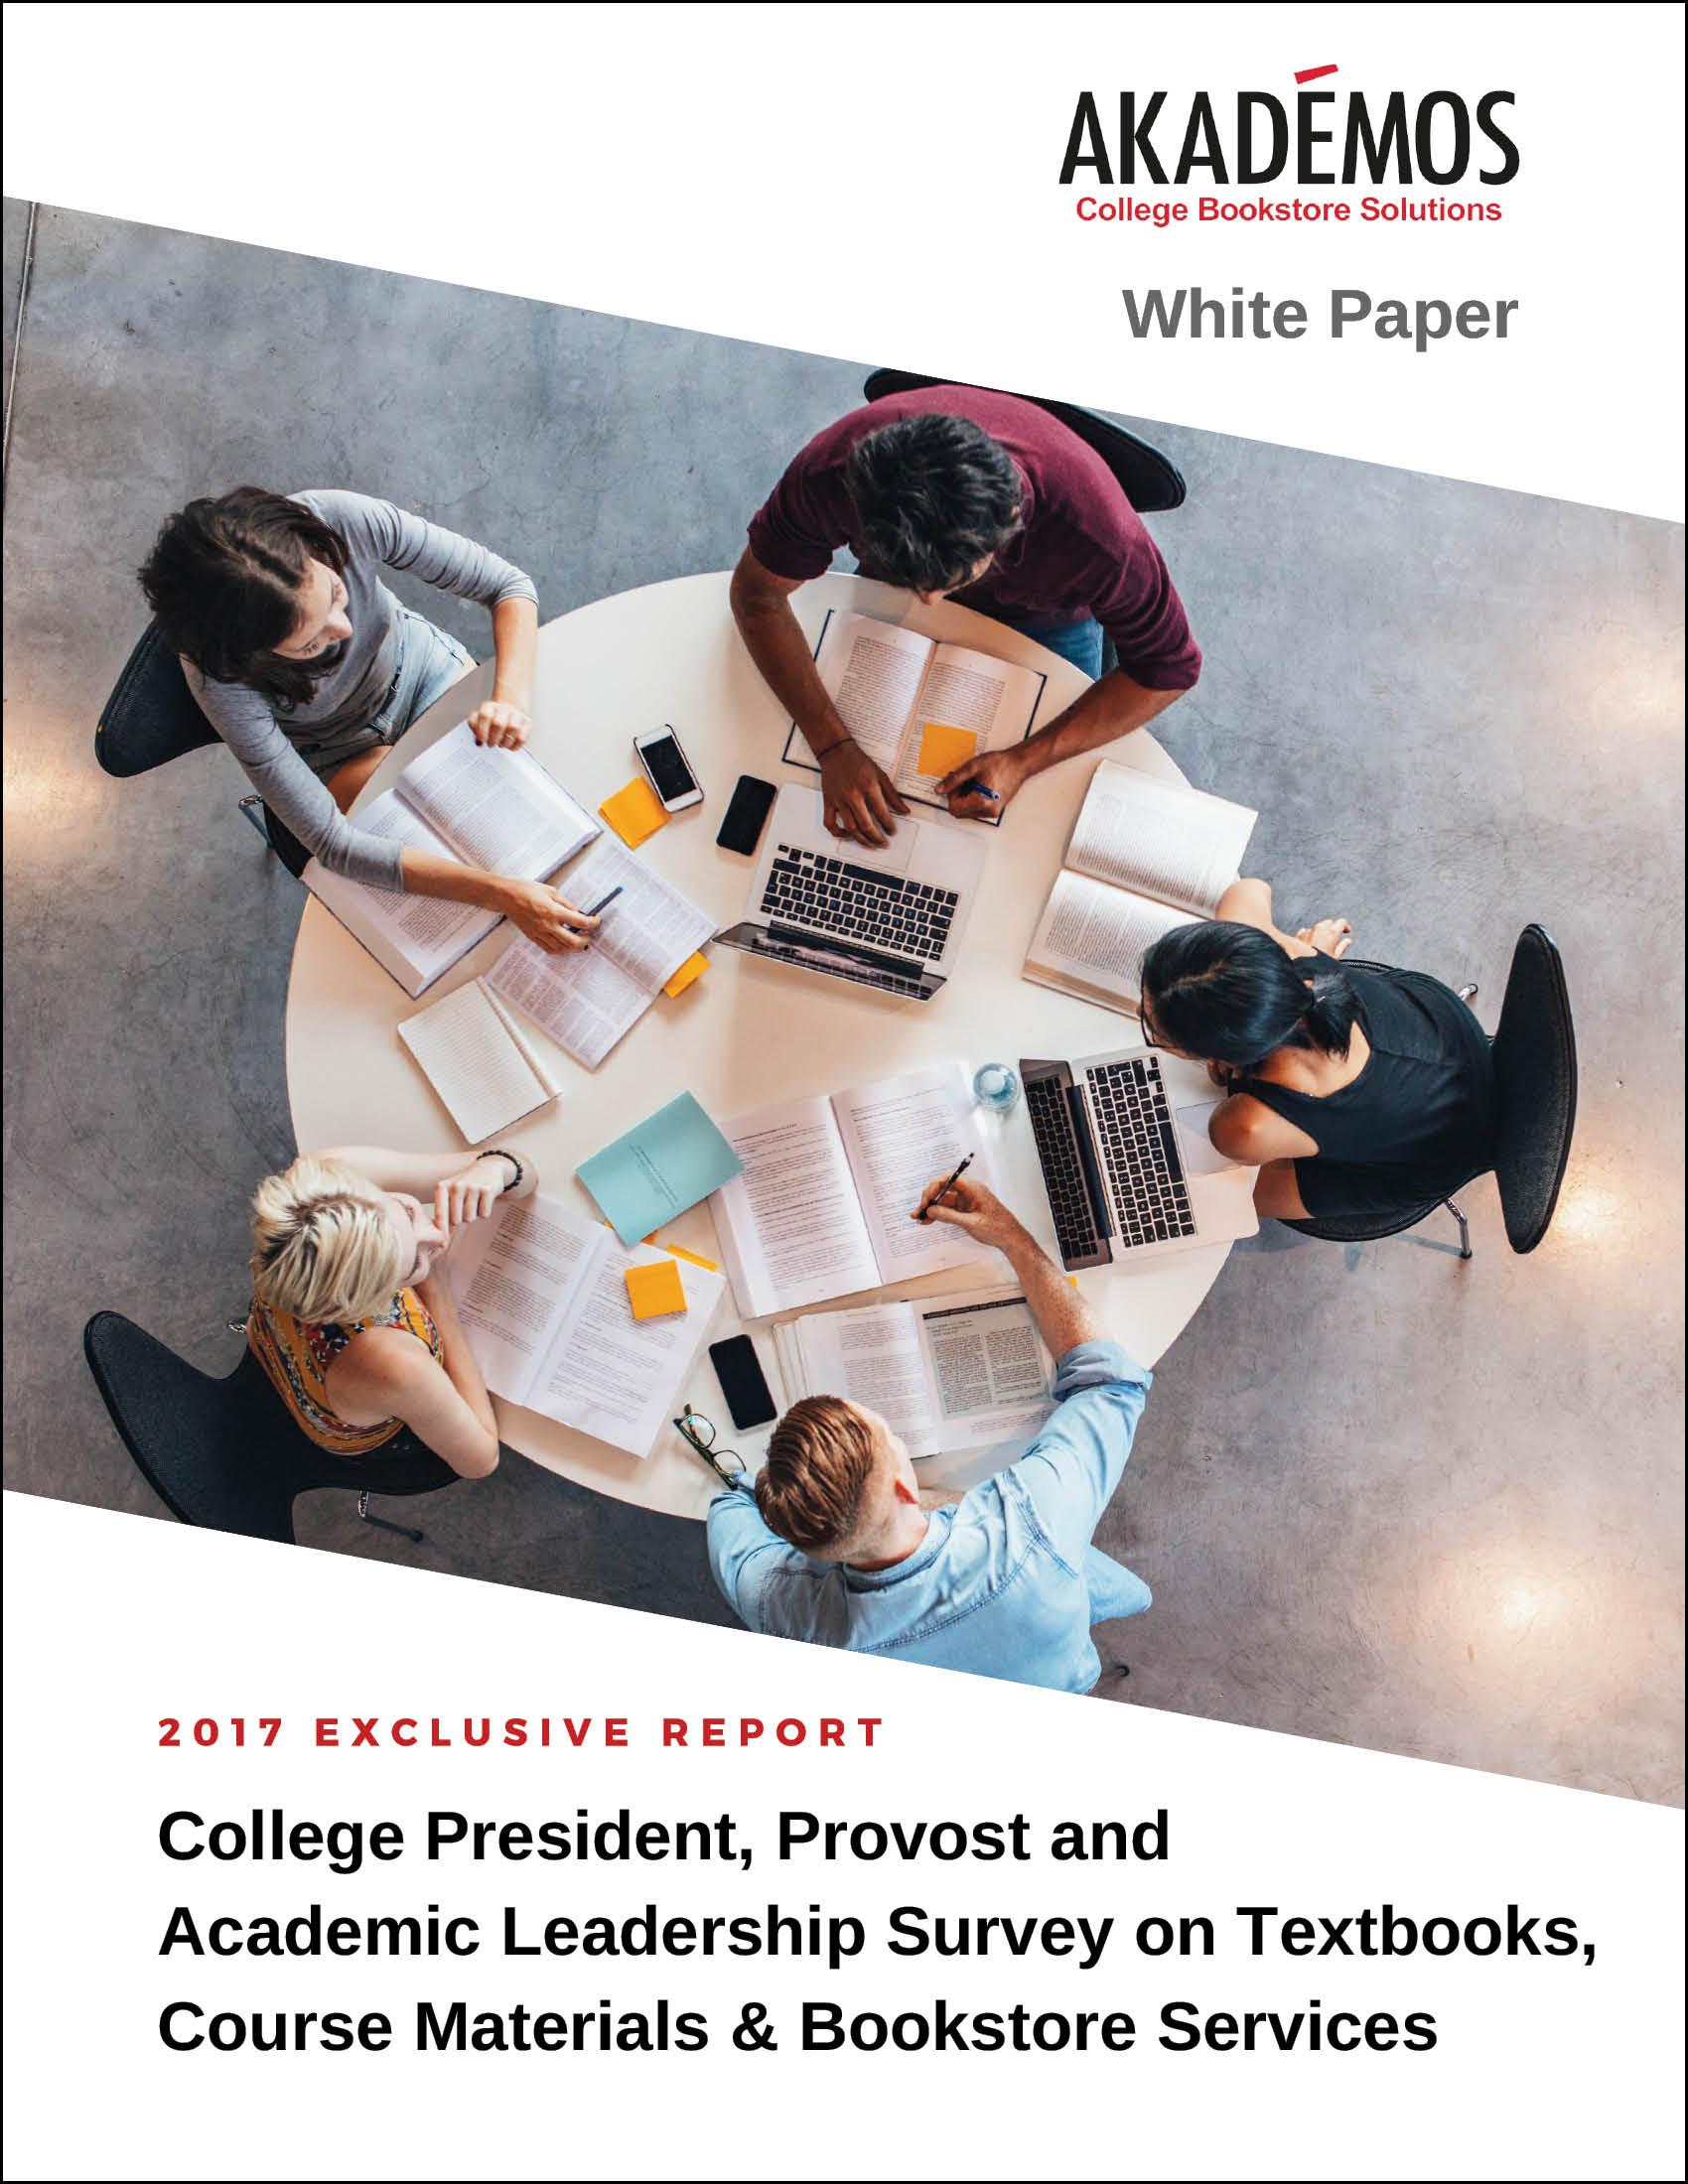 2017 CAO White Paper Image.jpg